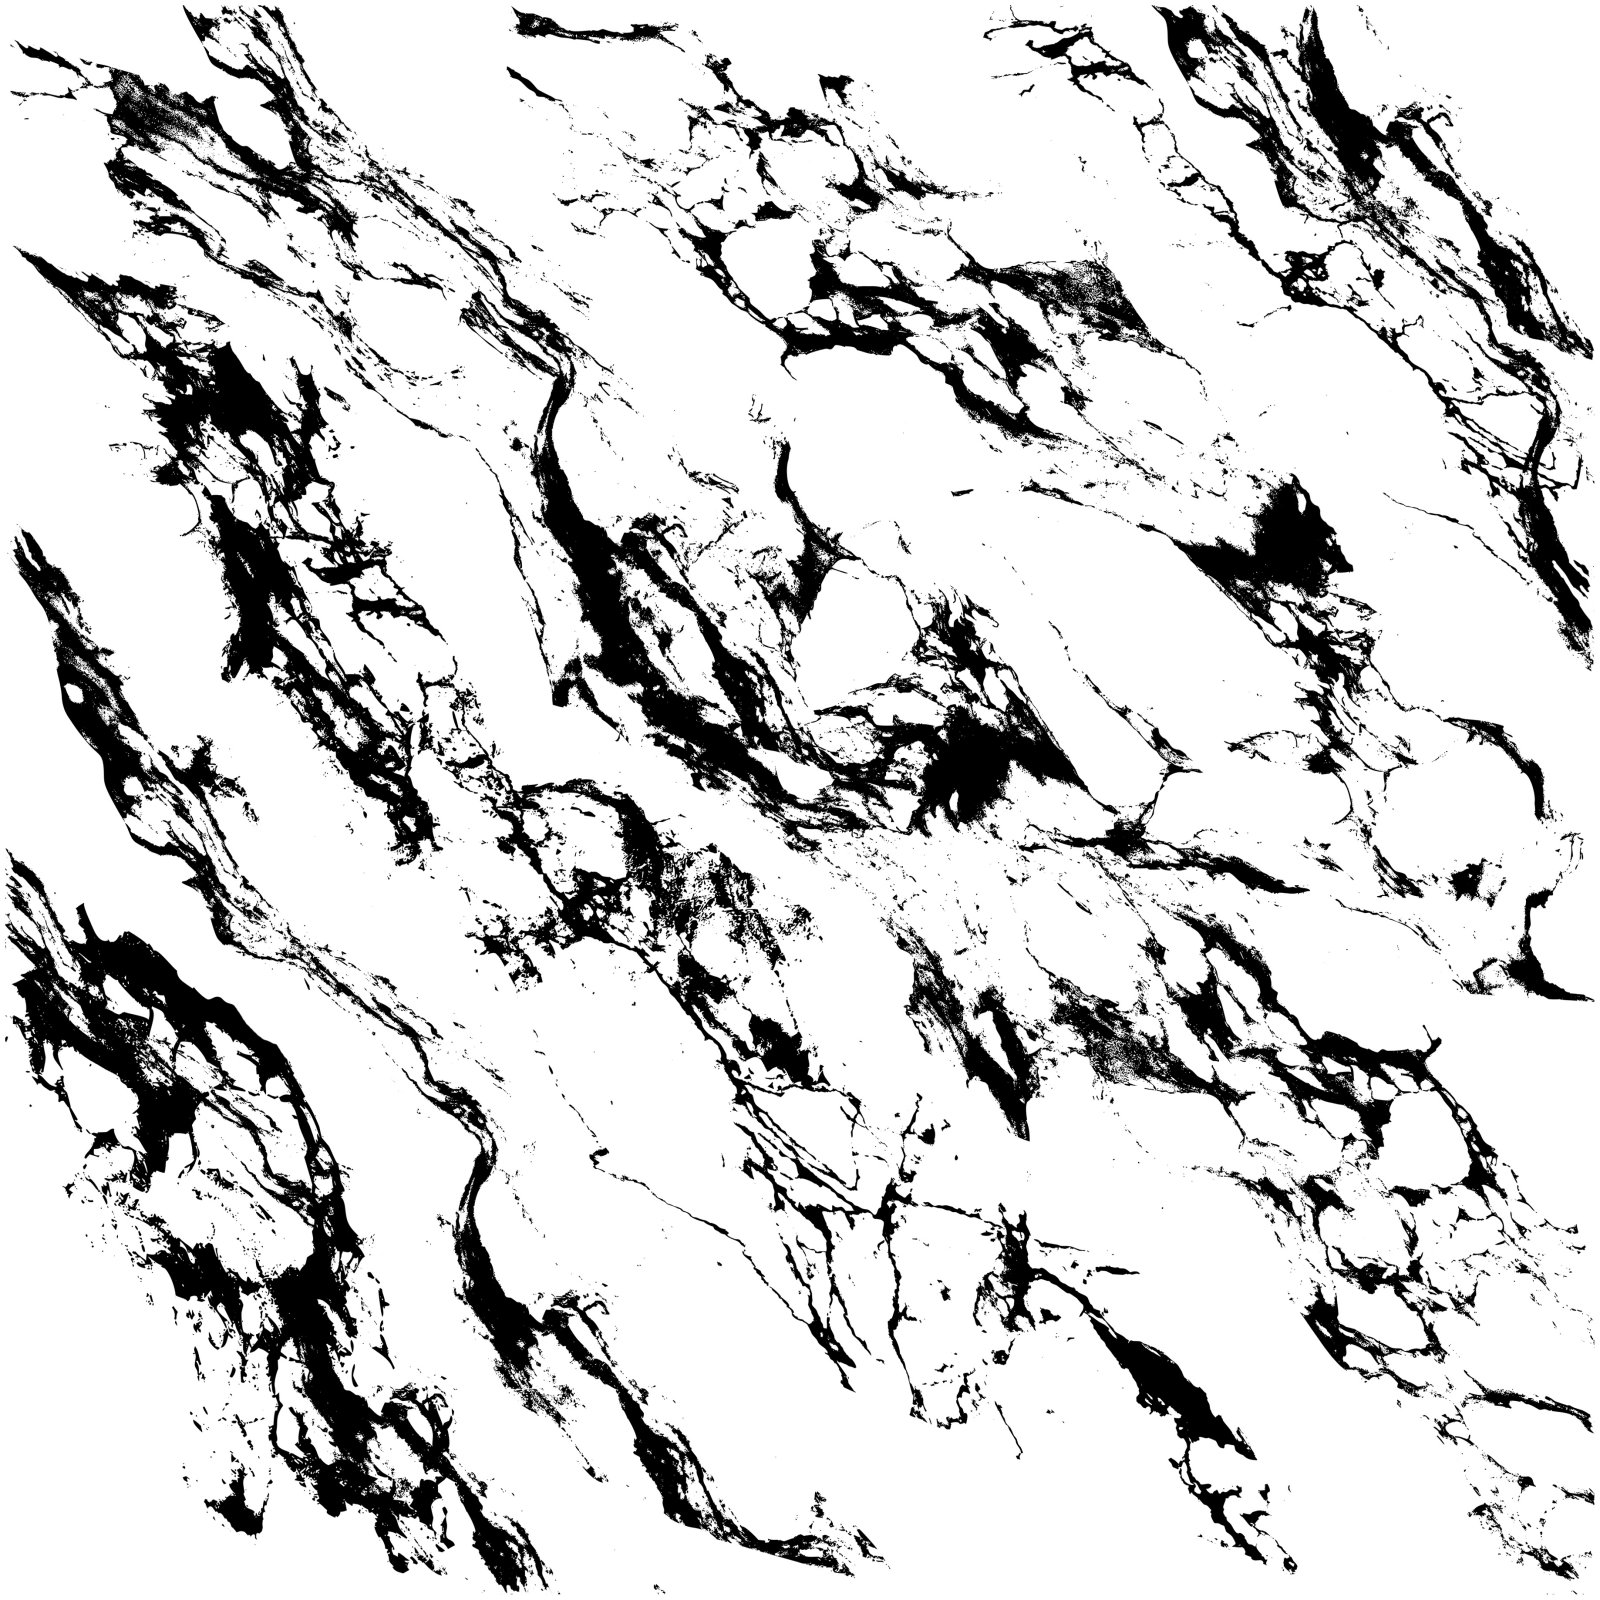 Carrara Marble Paint12 x 12 IOD Decor Stamp